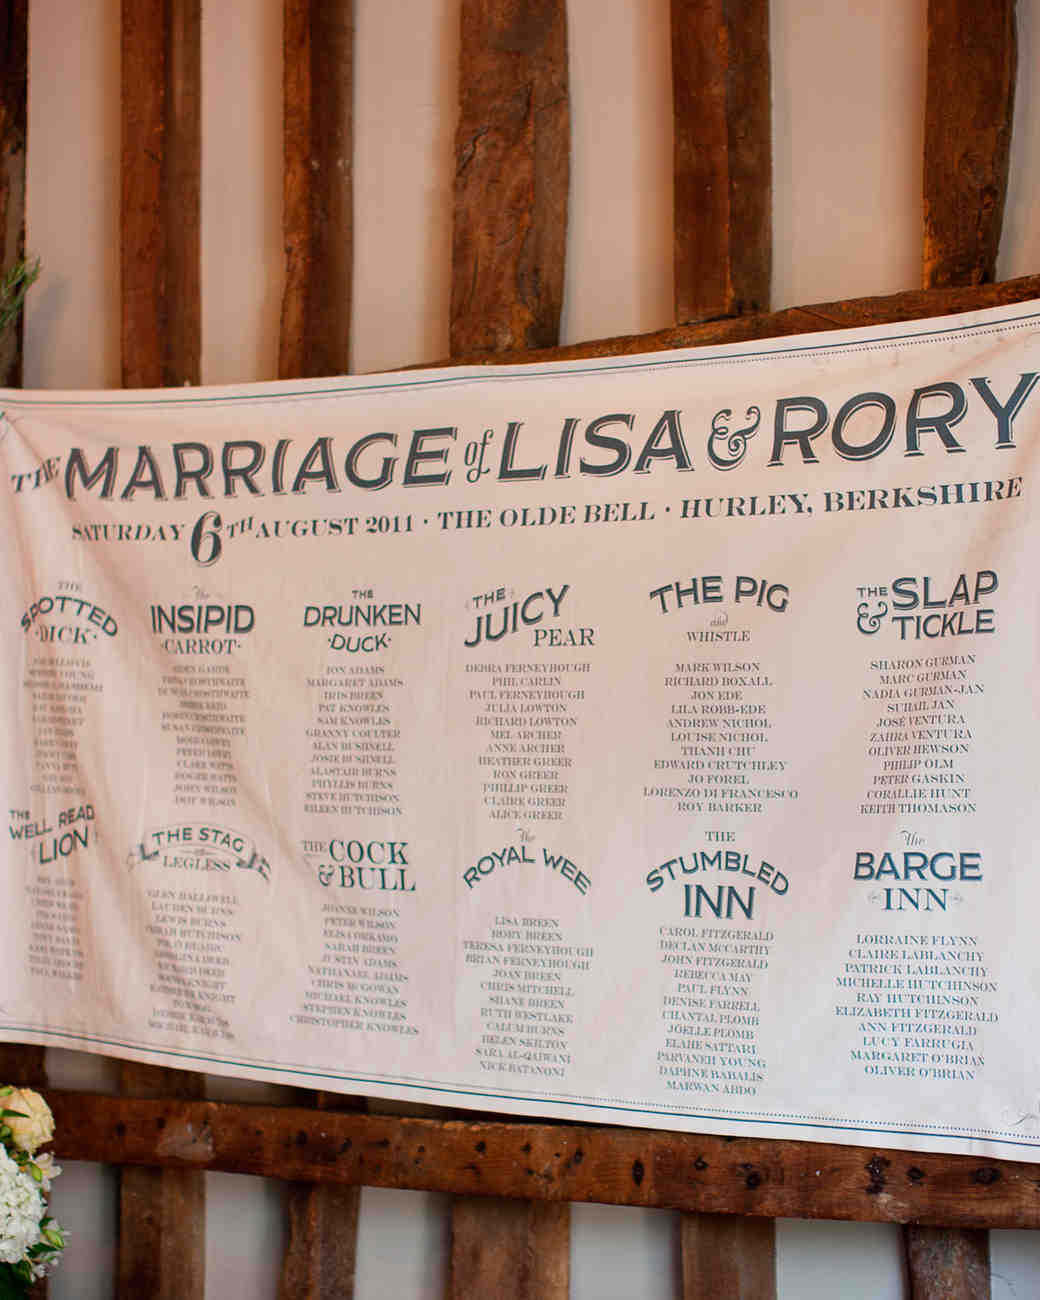 lisa-rory-rw-358.jpg